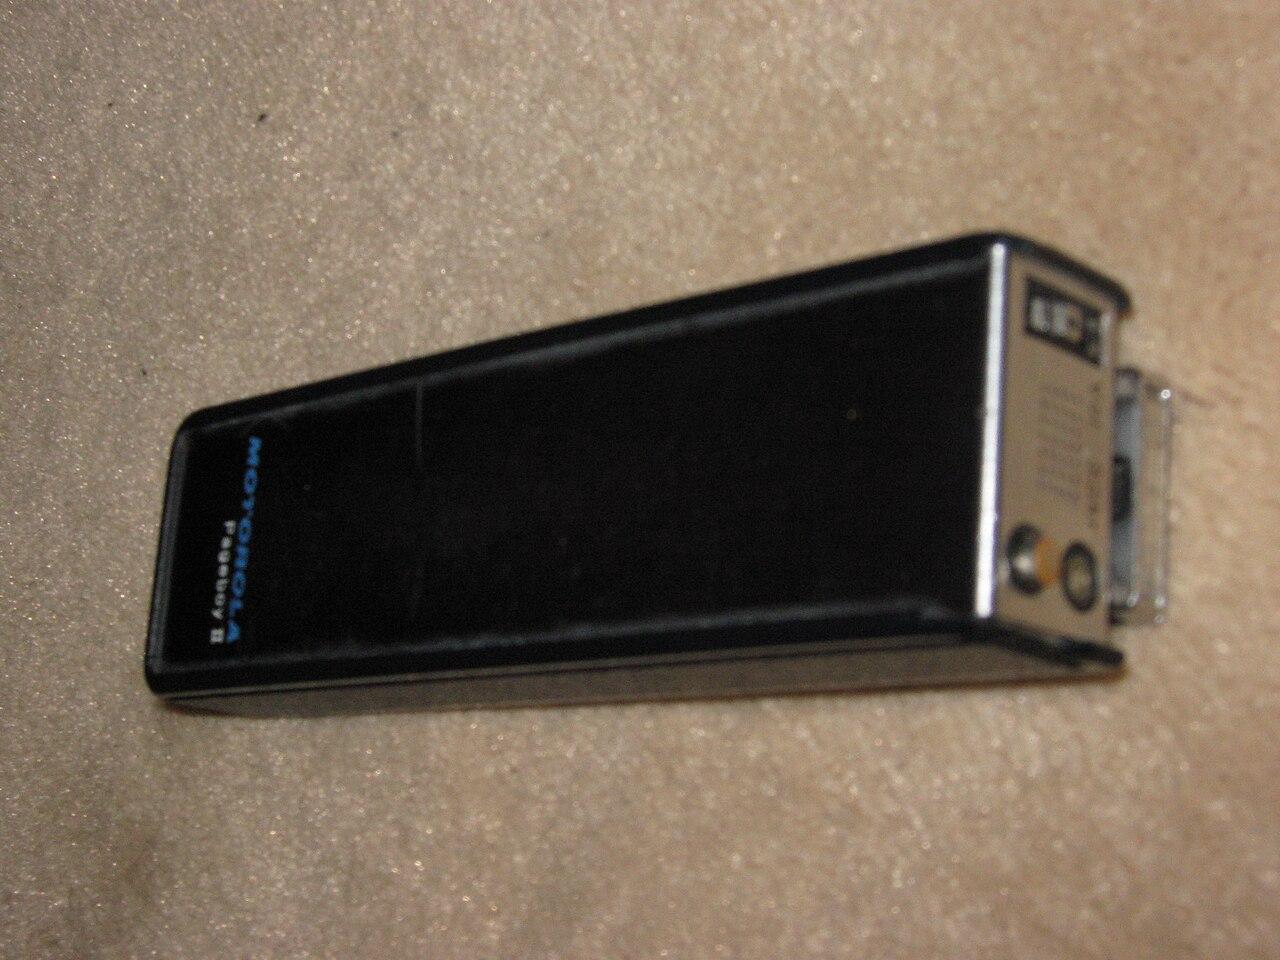 File:Motorola PageBoy II.jpg - Wikimedia Commons